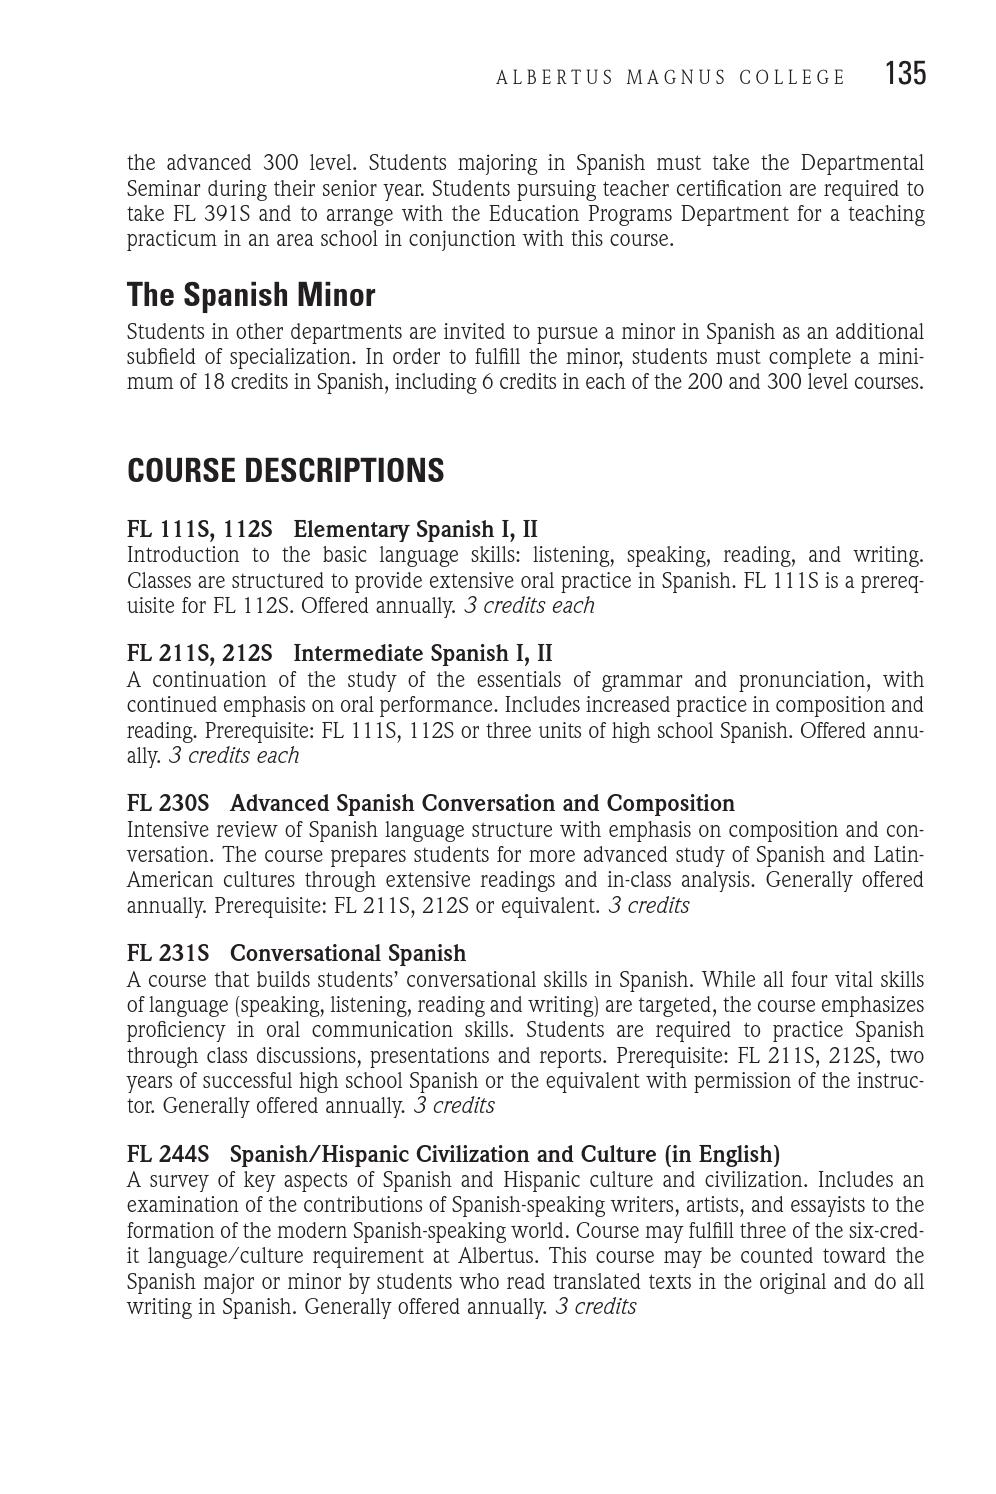 Albertus magnus college course catalogue 2013 2015 by albertus albertus magnus college course catalogue 2013 2015 by albertus magnus college issuu xflitez Images